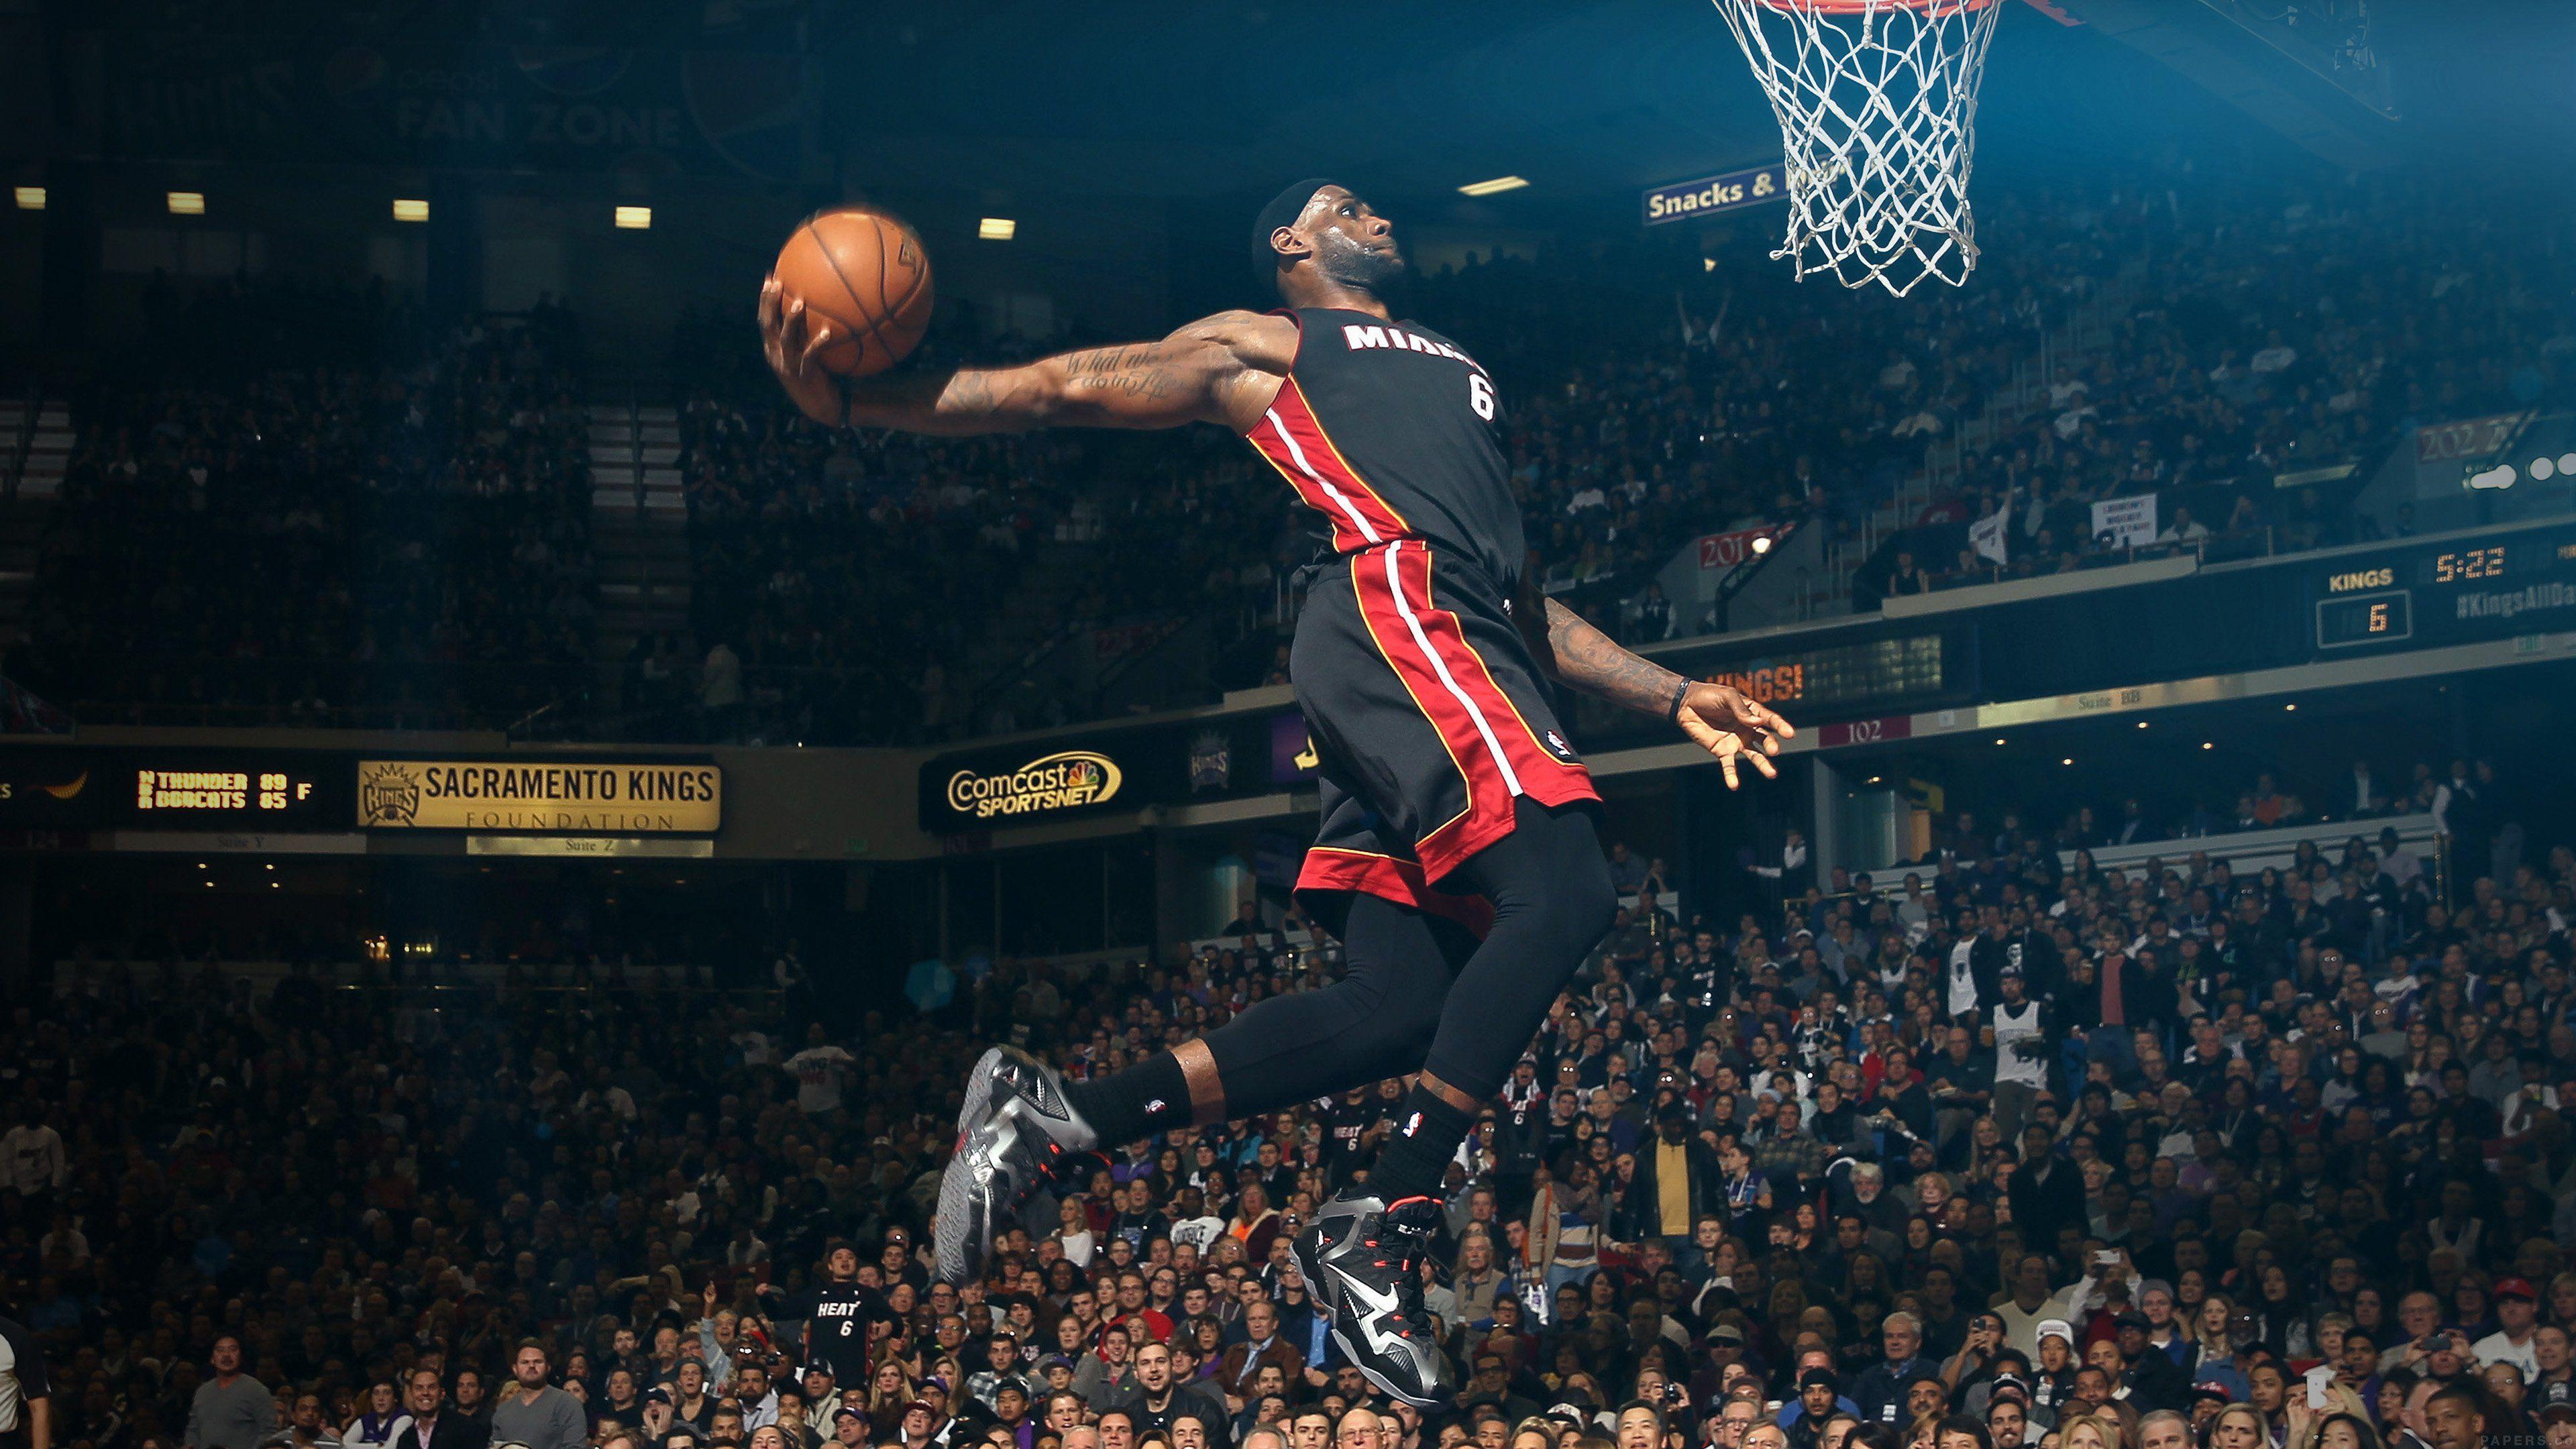 Hi84 Lebron James Nba Basketball Dunk Wallpaper: Top Free 4K NBA Backgrounds